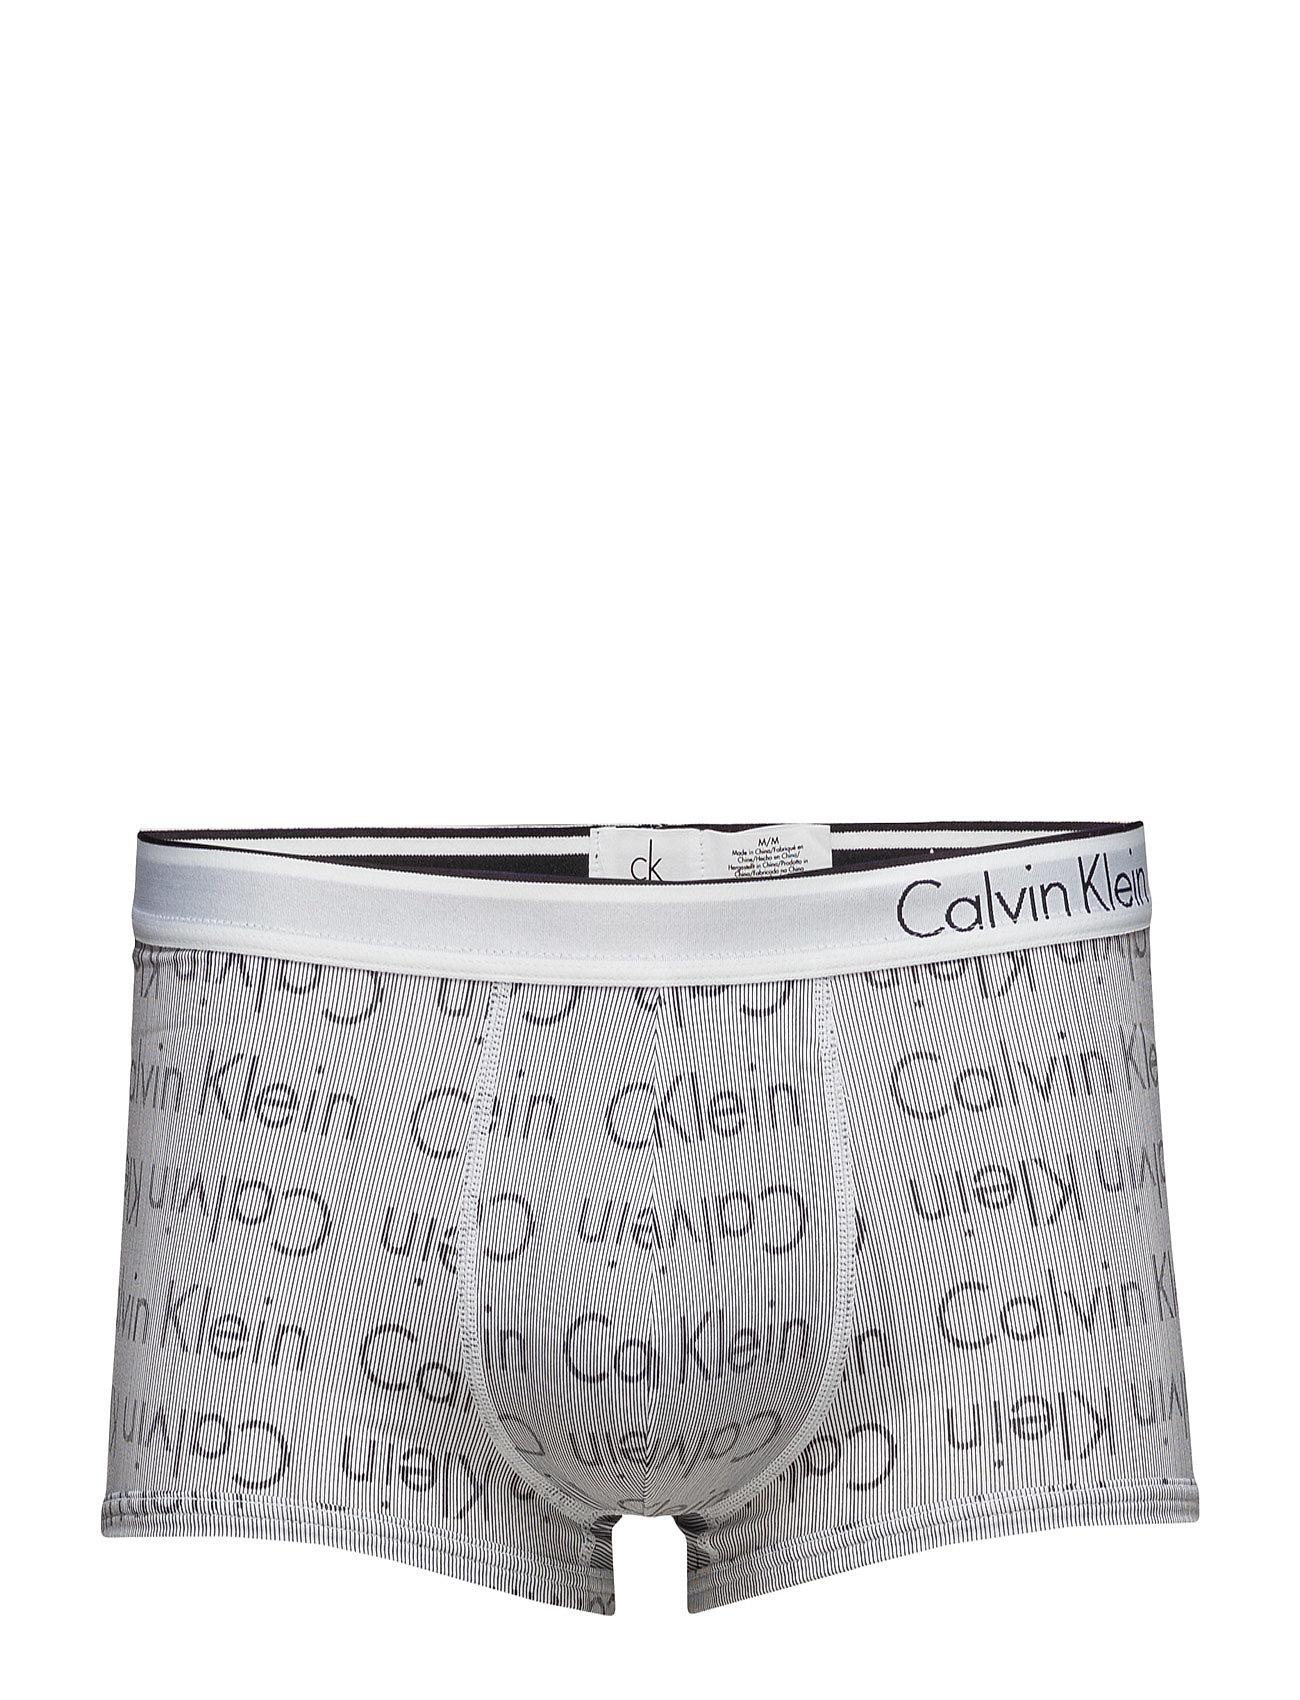 Low Rise Trunk 1ot, Calvin Klein Boxershorts til Herrer i